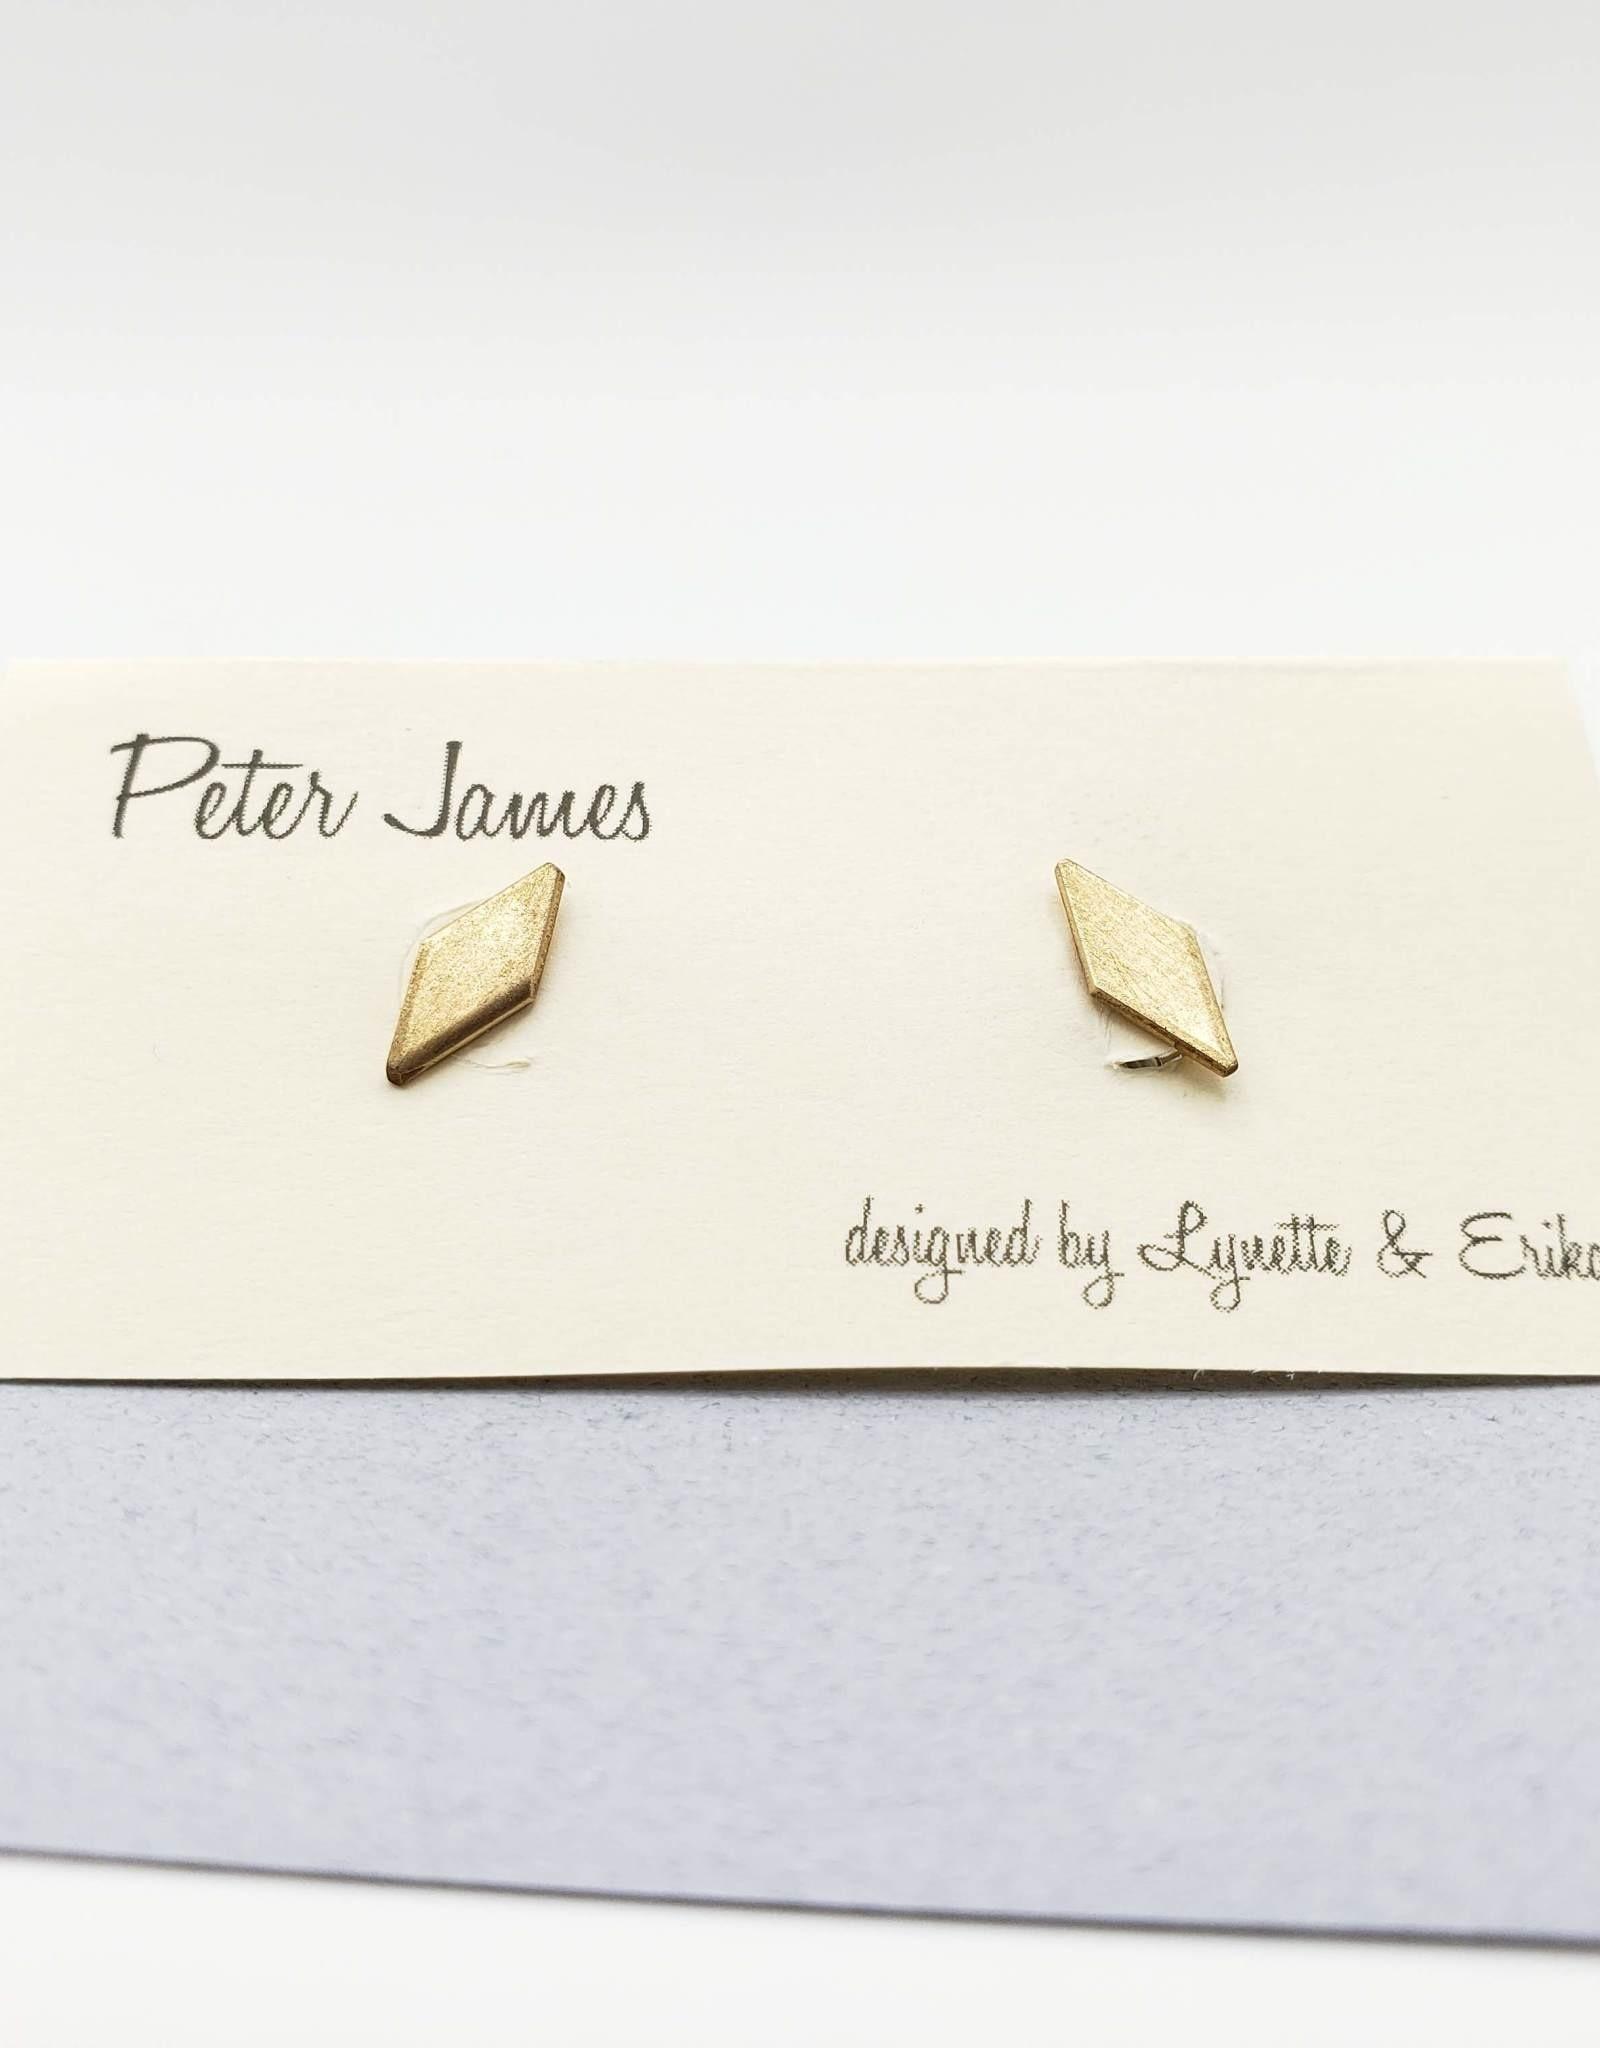 Peter James Jewelry Diamond Shaped Stud Earrings - Brass